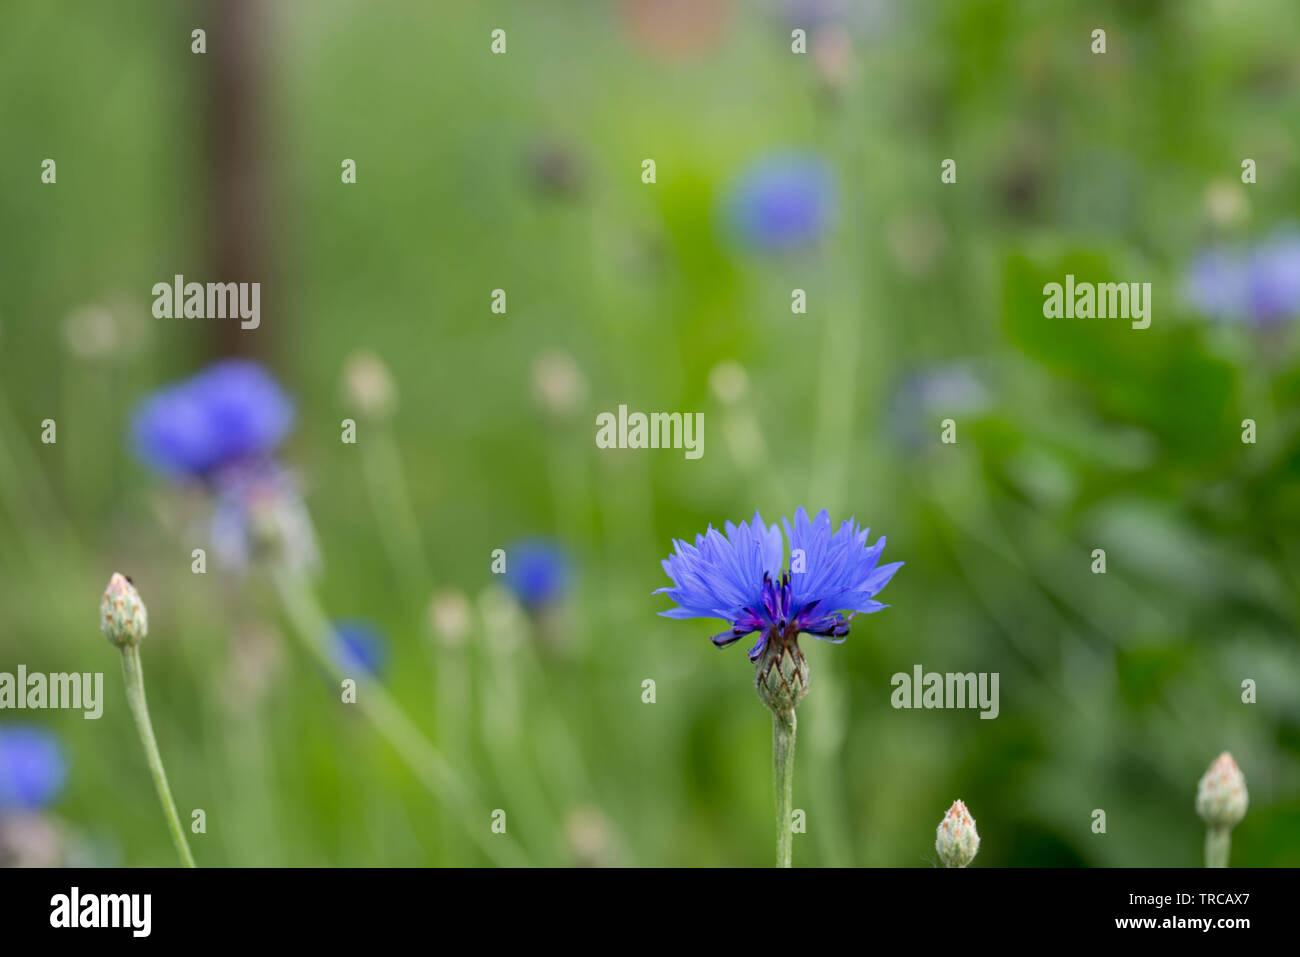 Centaurea cyanus, Fiordaliso, laurea pulsante fiori blu in Prato Immagini Stock